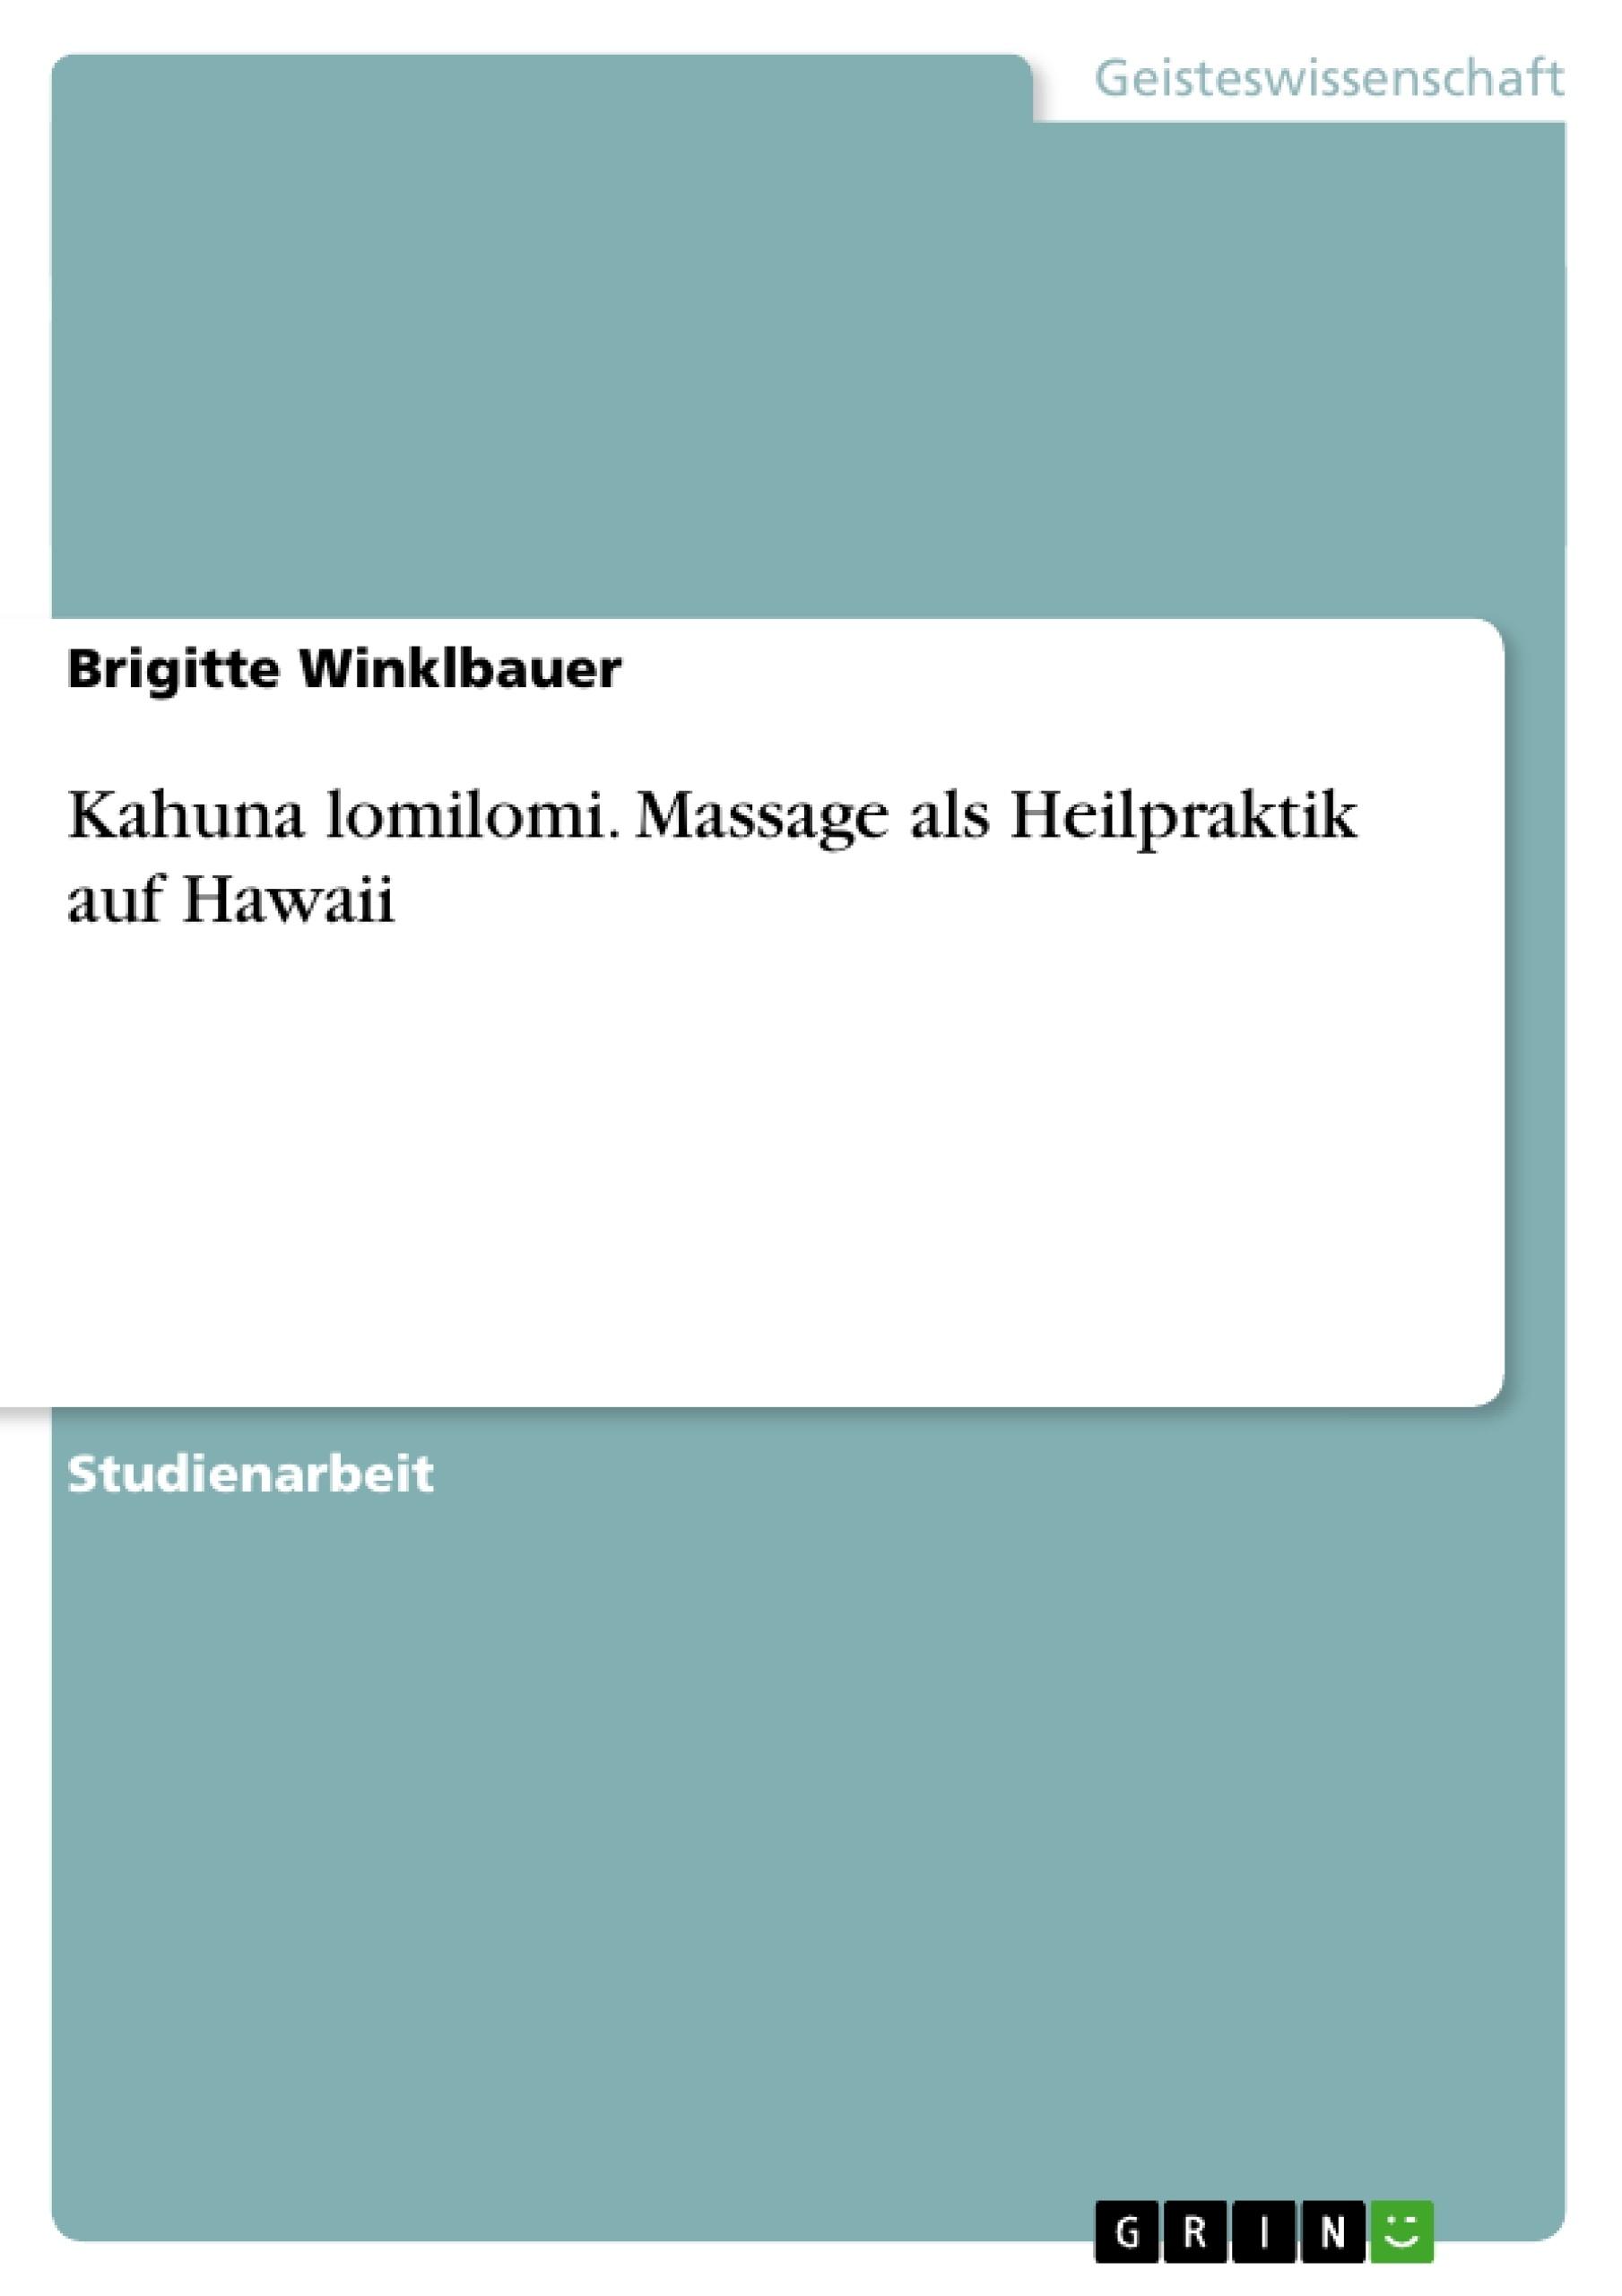 Arbeiten Auf Hawaii kahuna lomilomi als heilpraktik auf hawaii masterarbeit